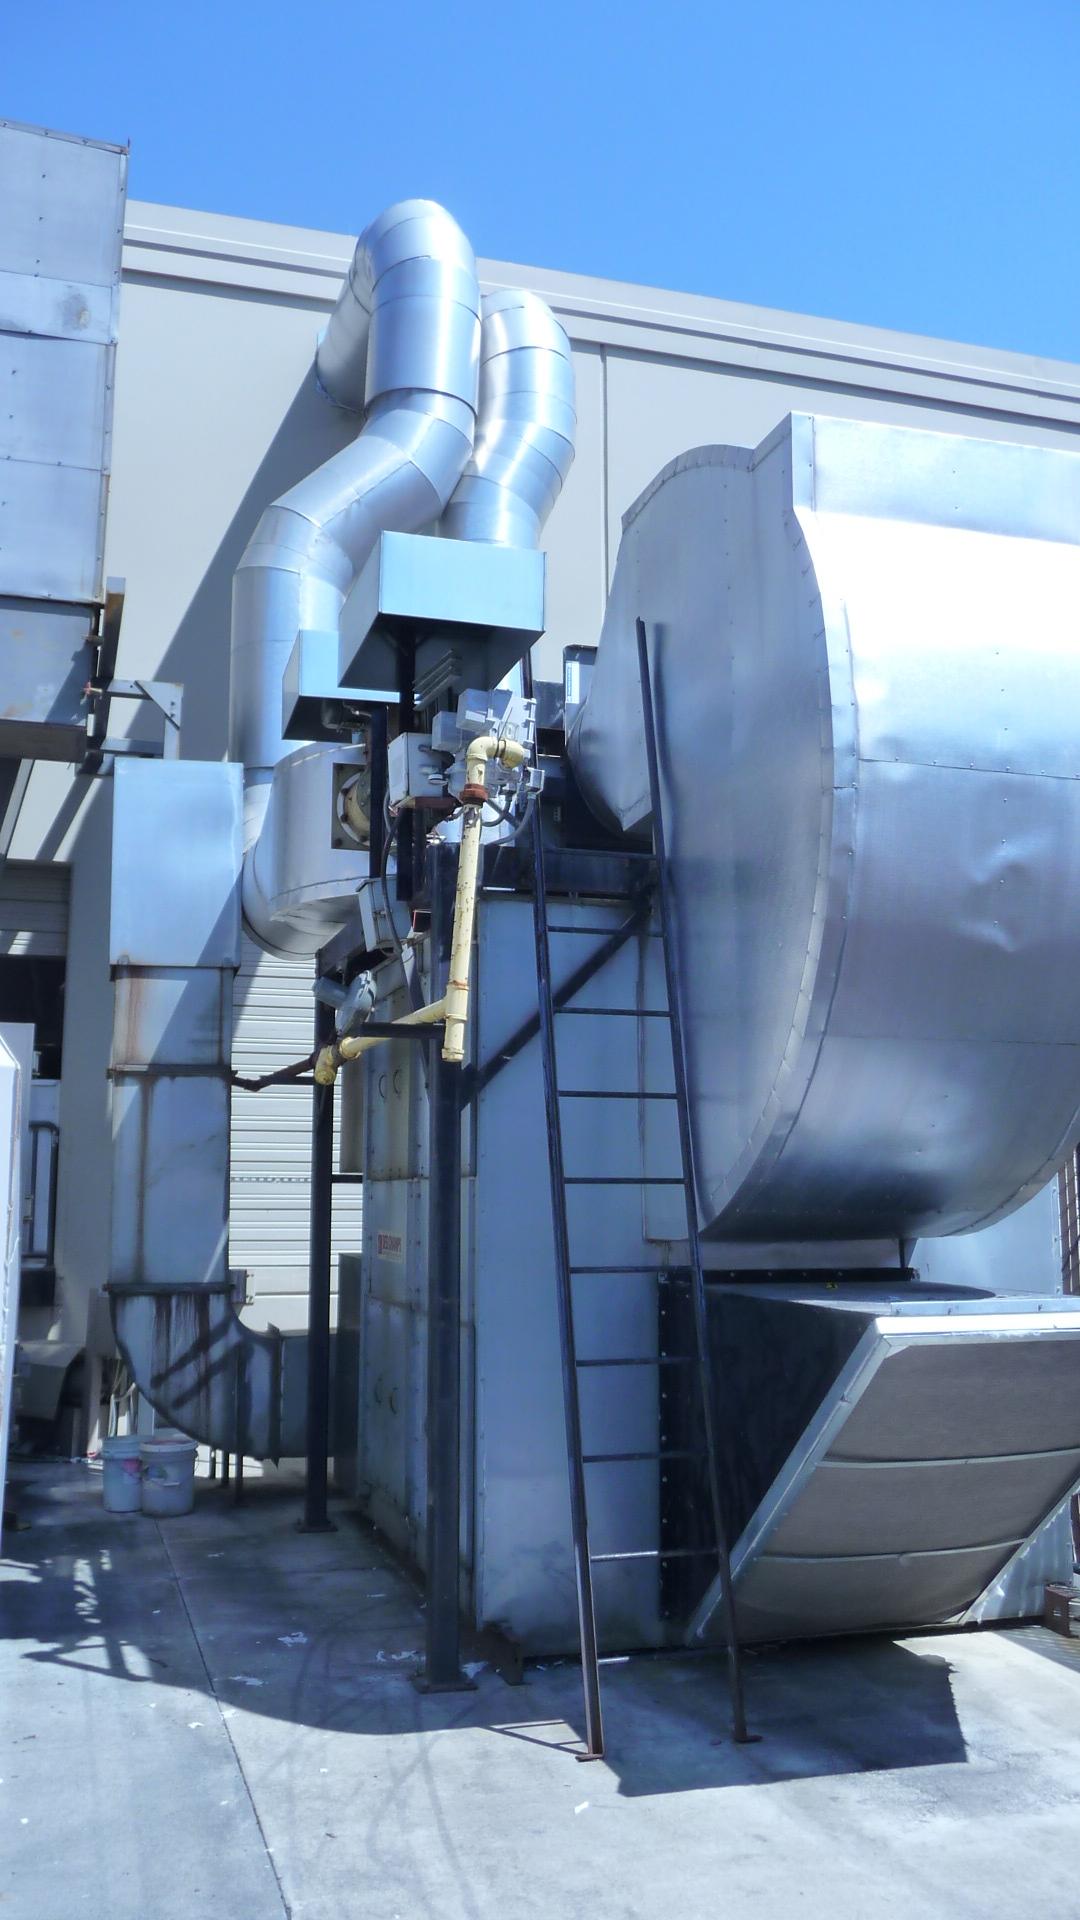 Comco Proglide MSP - Used Flexo Printing Presses and Used Flexographic Equipment-11